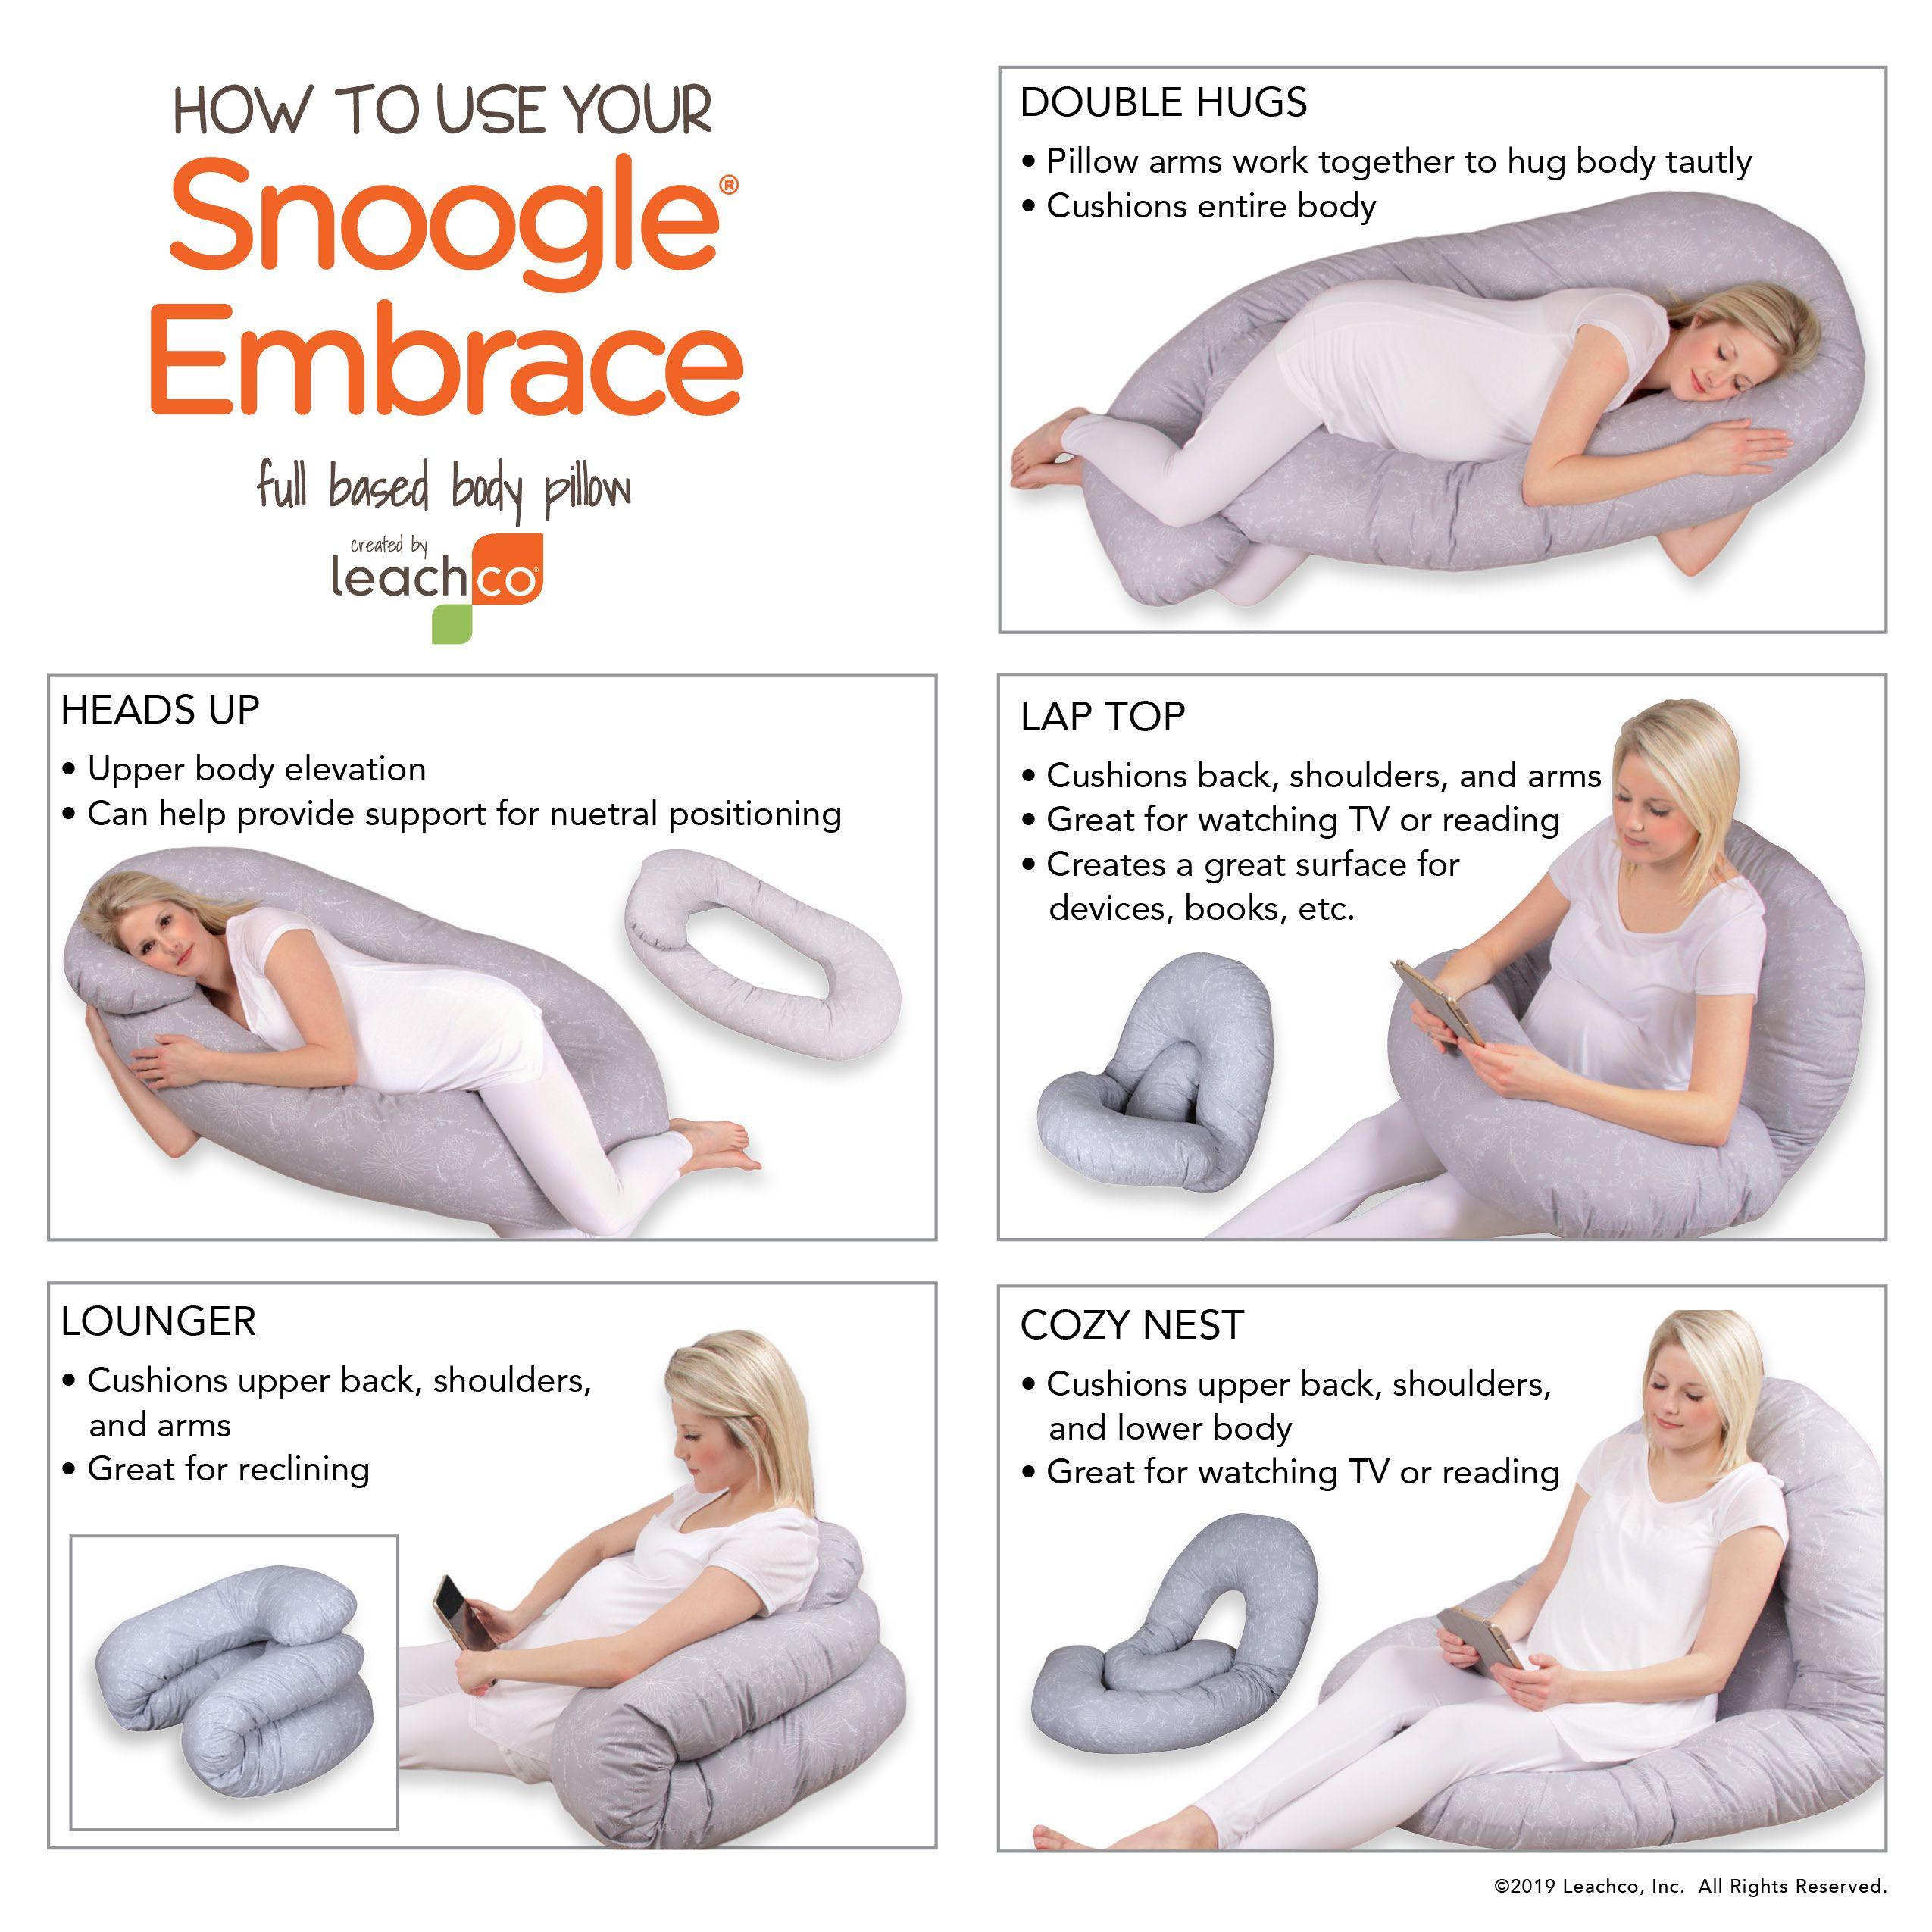 snoogle embrace body pillow hug